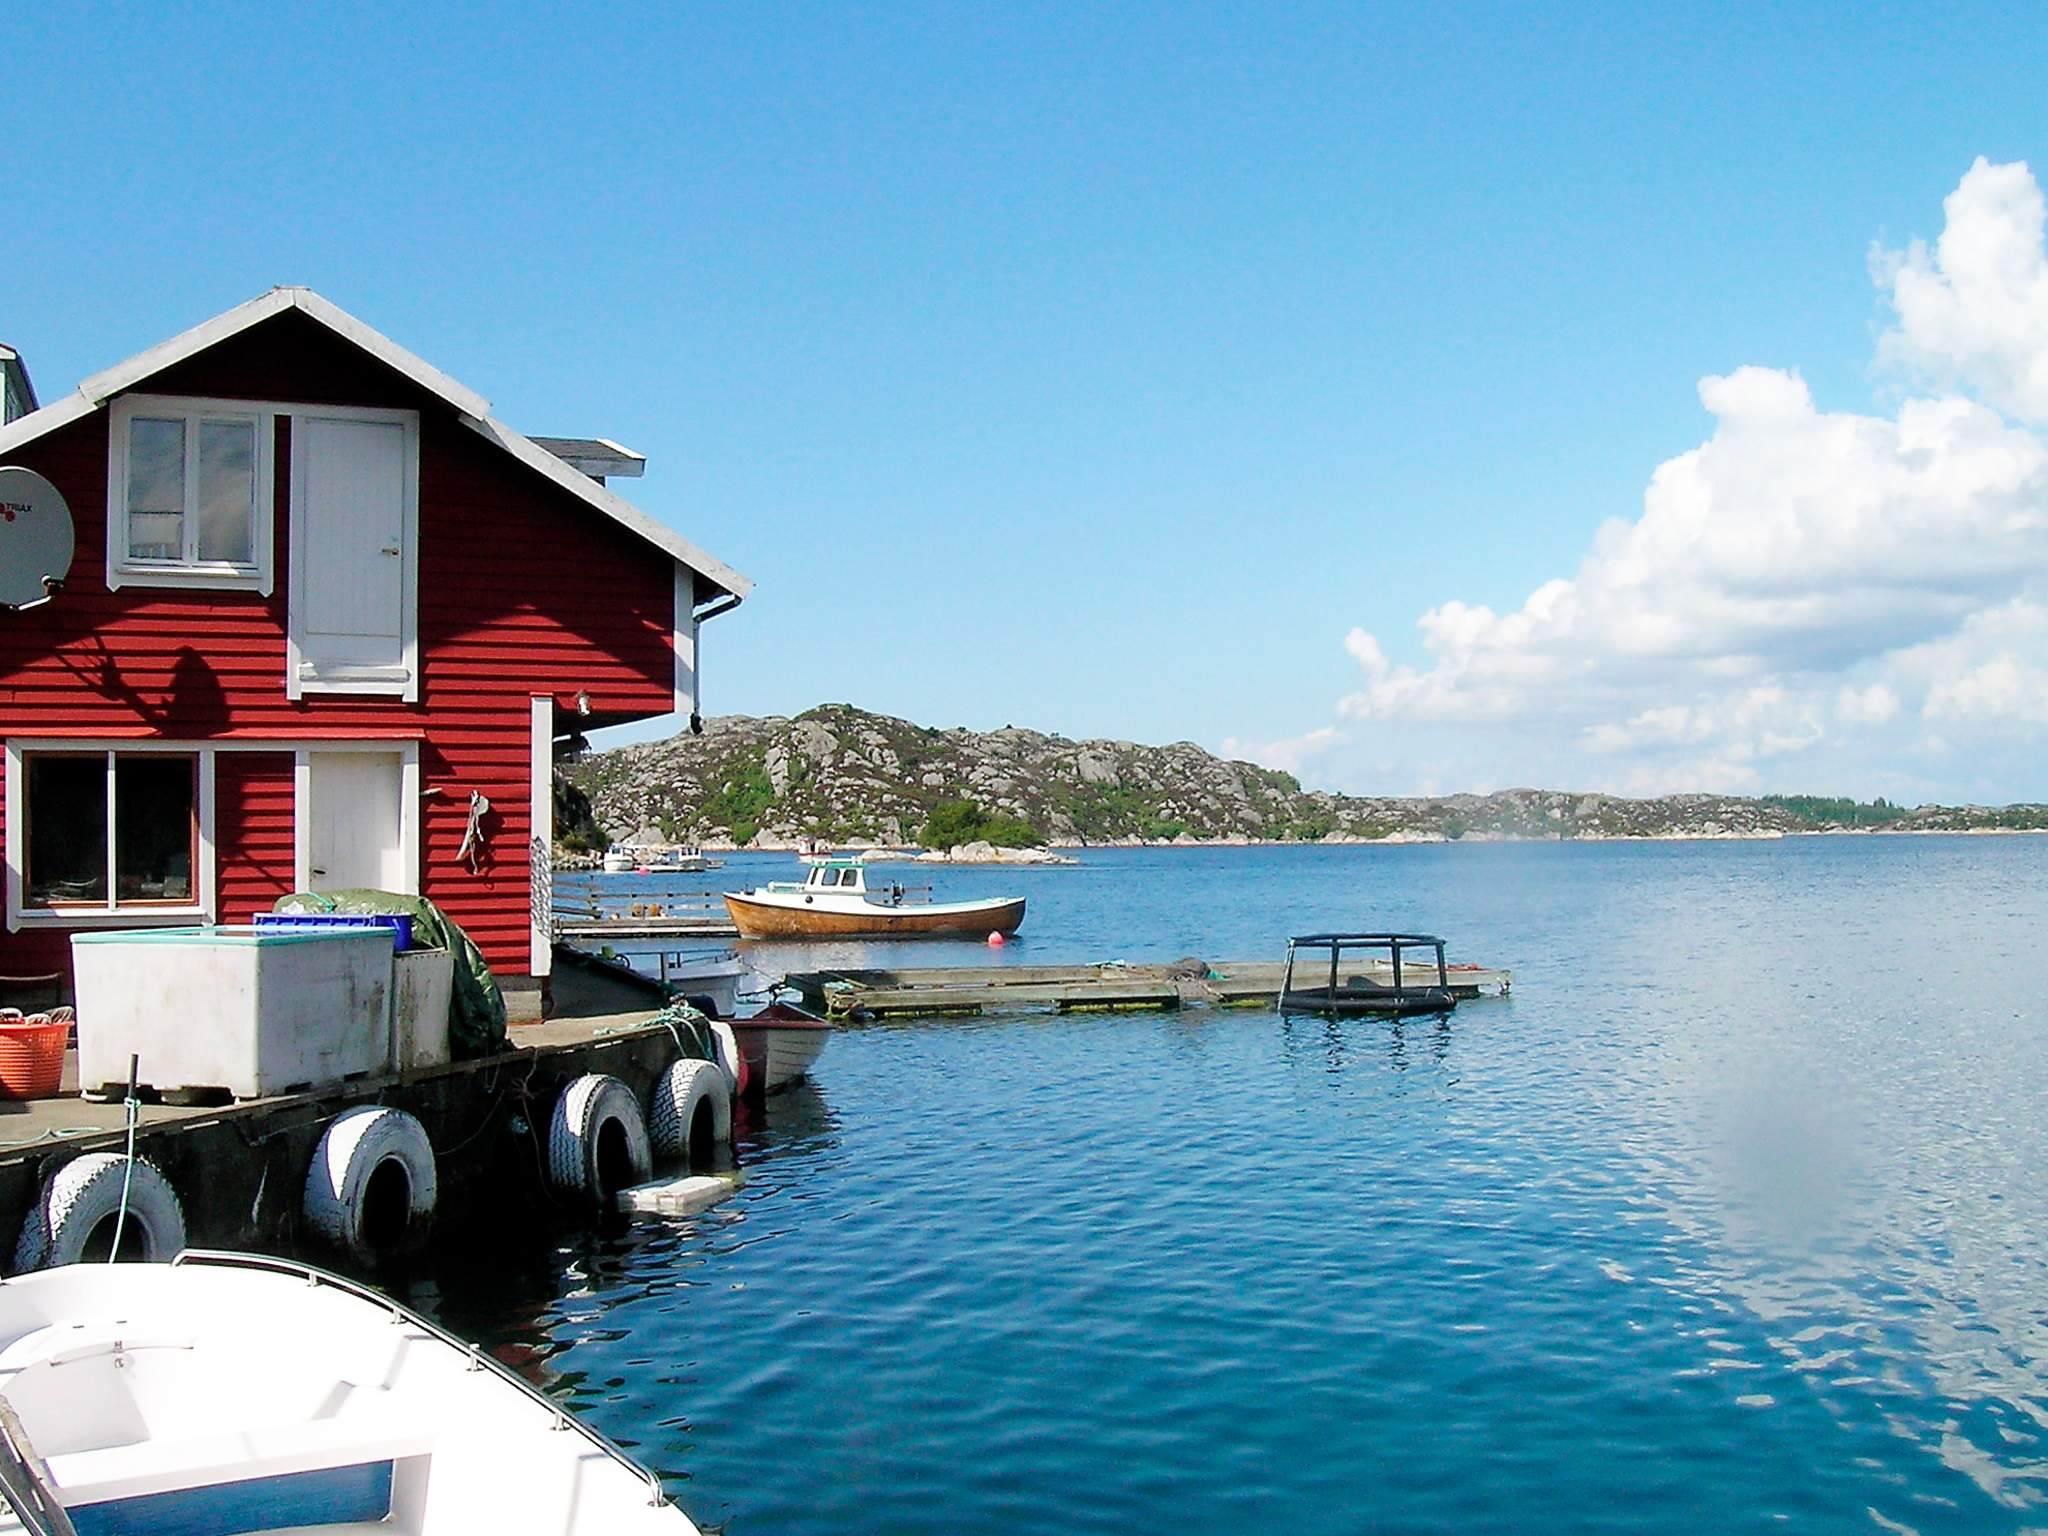 Ferienhaus Rolvsnes (84345), Rubbestadneset, Hordaland - Hardangerfjord, Westnorwegen, Norwegen, Bild 13